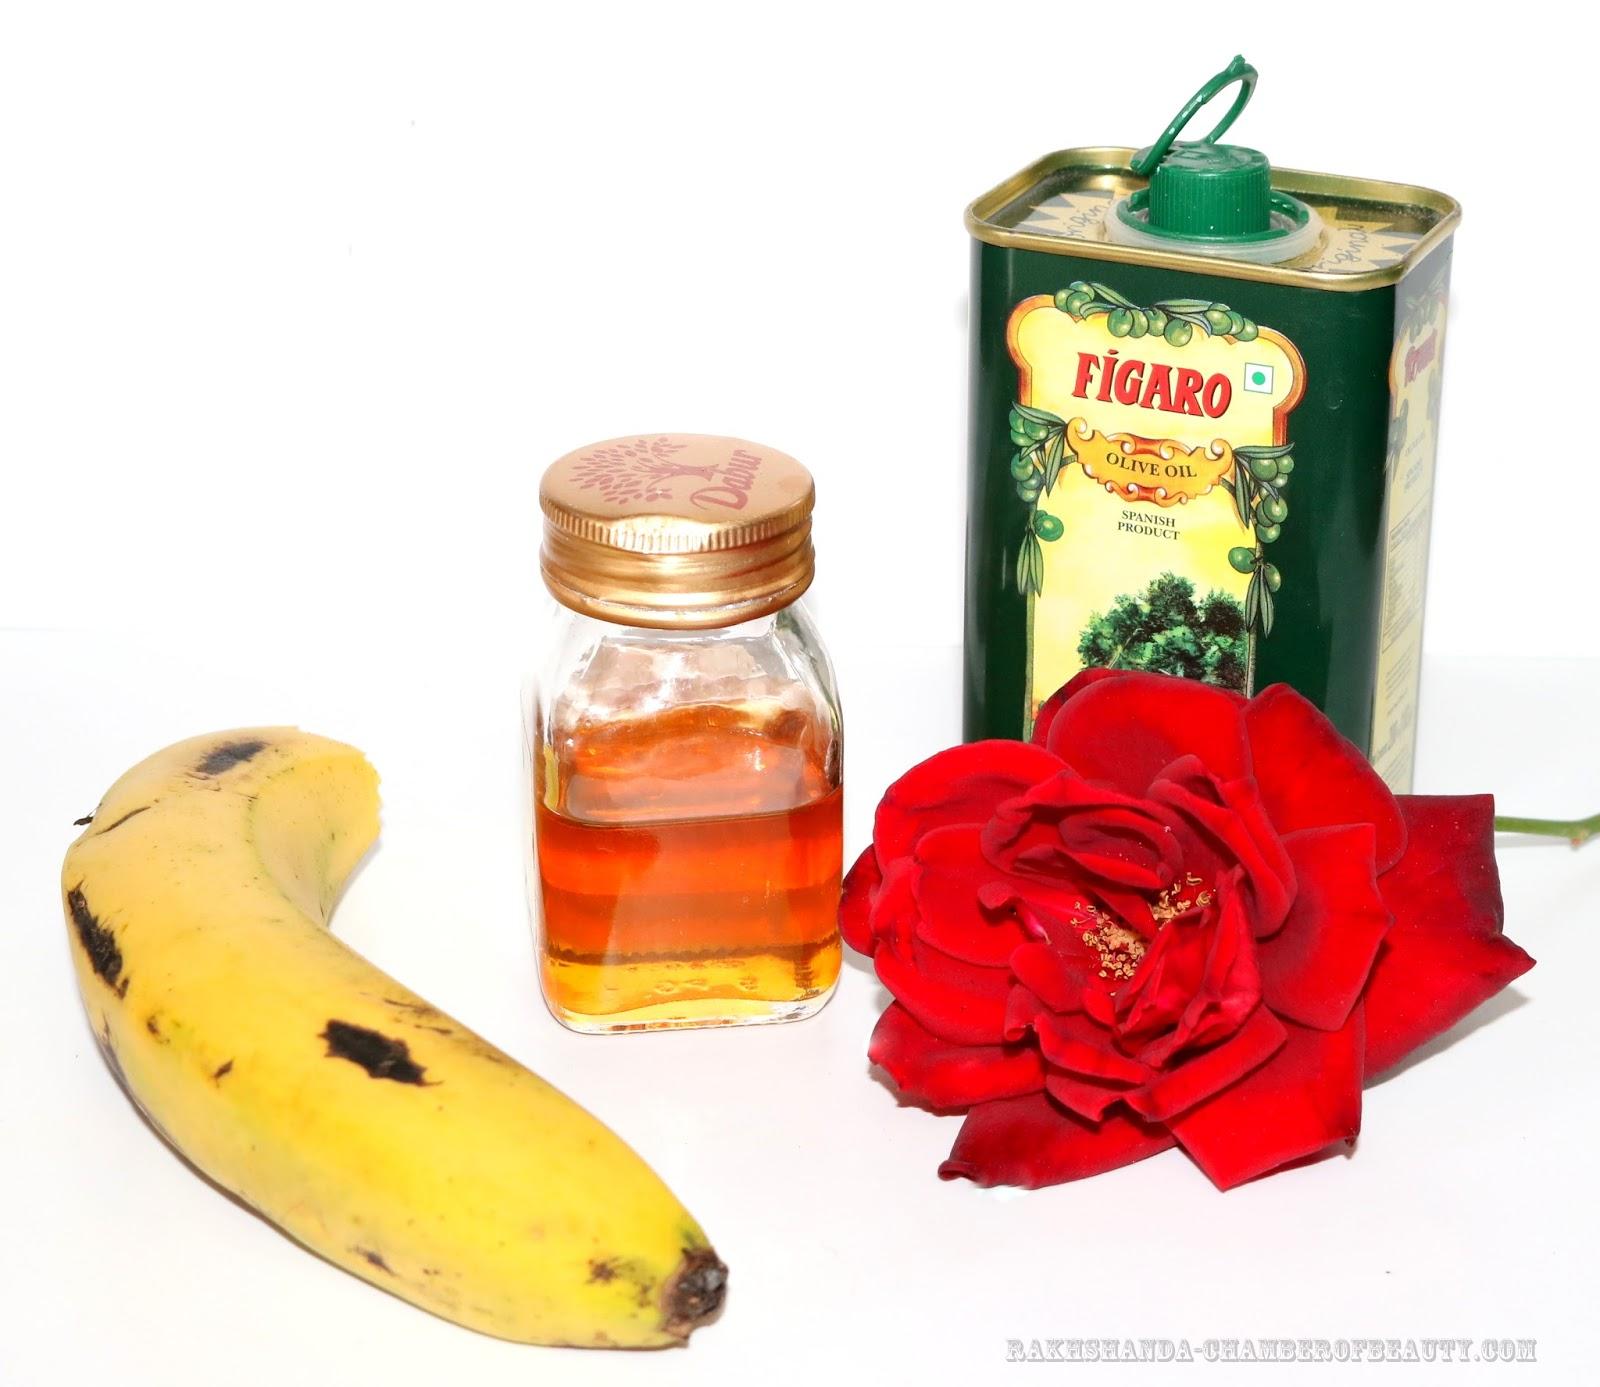 rakhshanda-chamberofbeauty.com/DIY/Banana & Rose Petals Face Pack for Dry skin